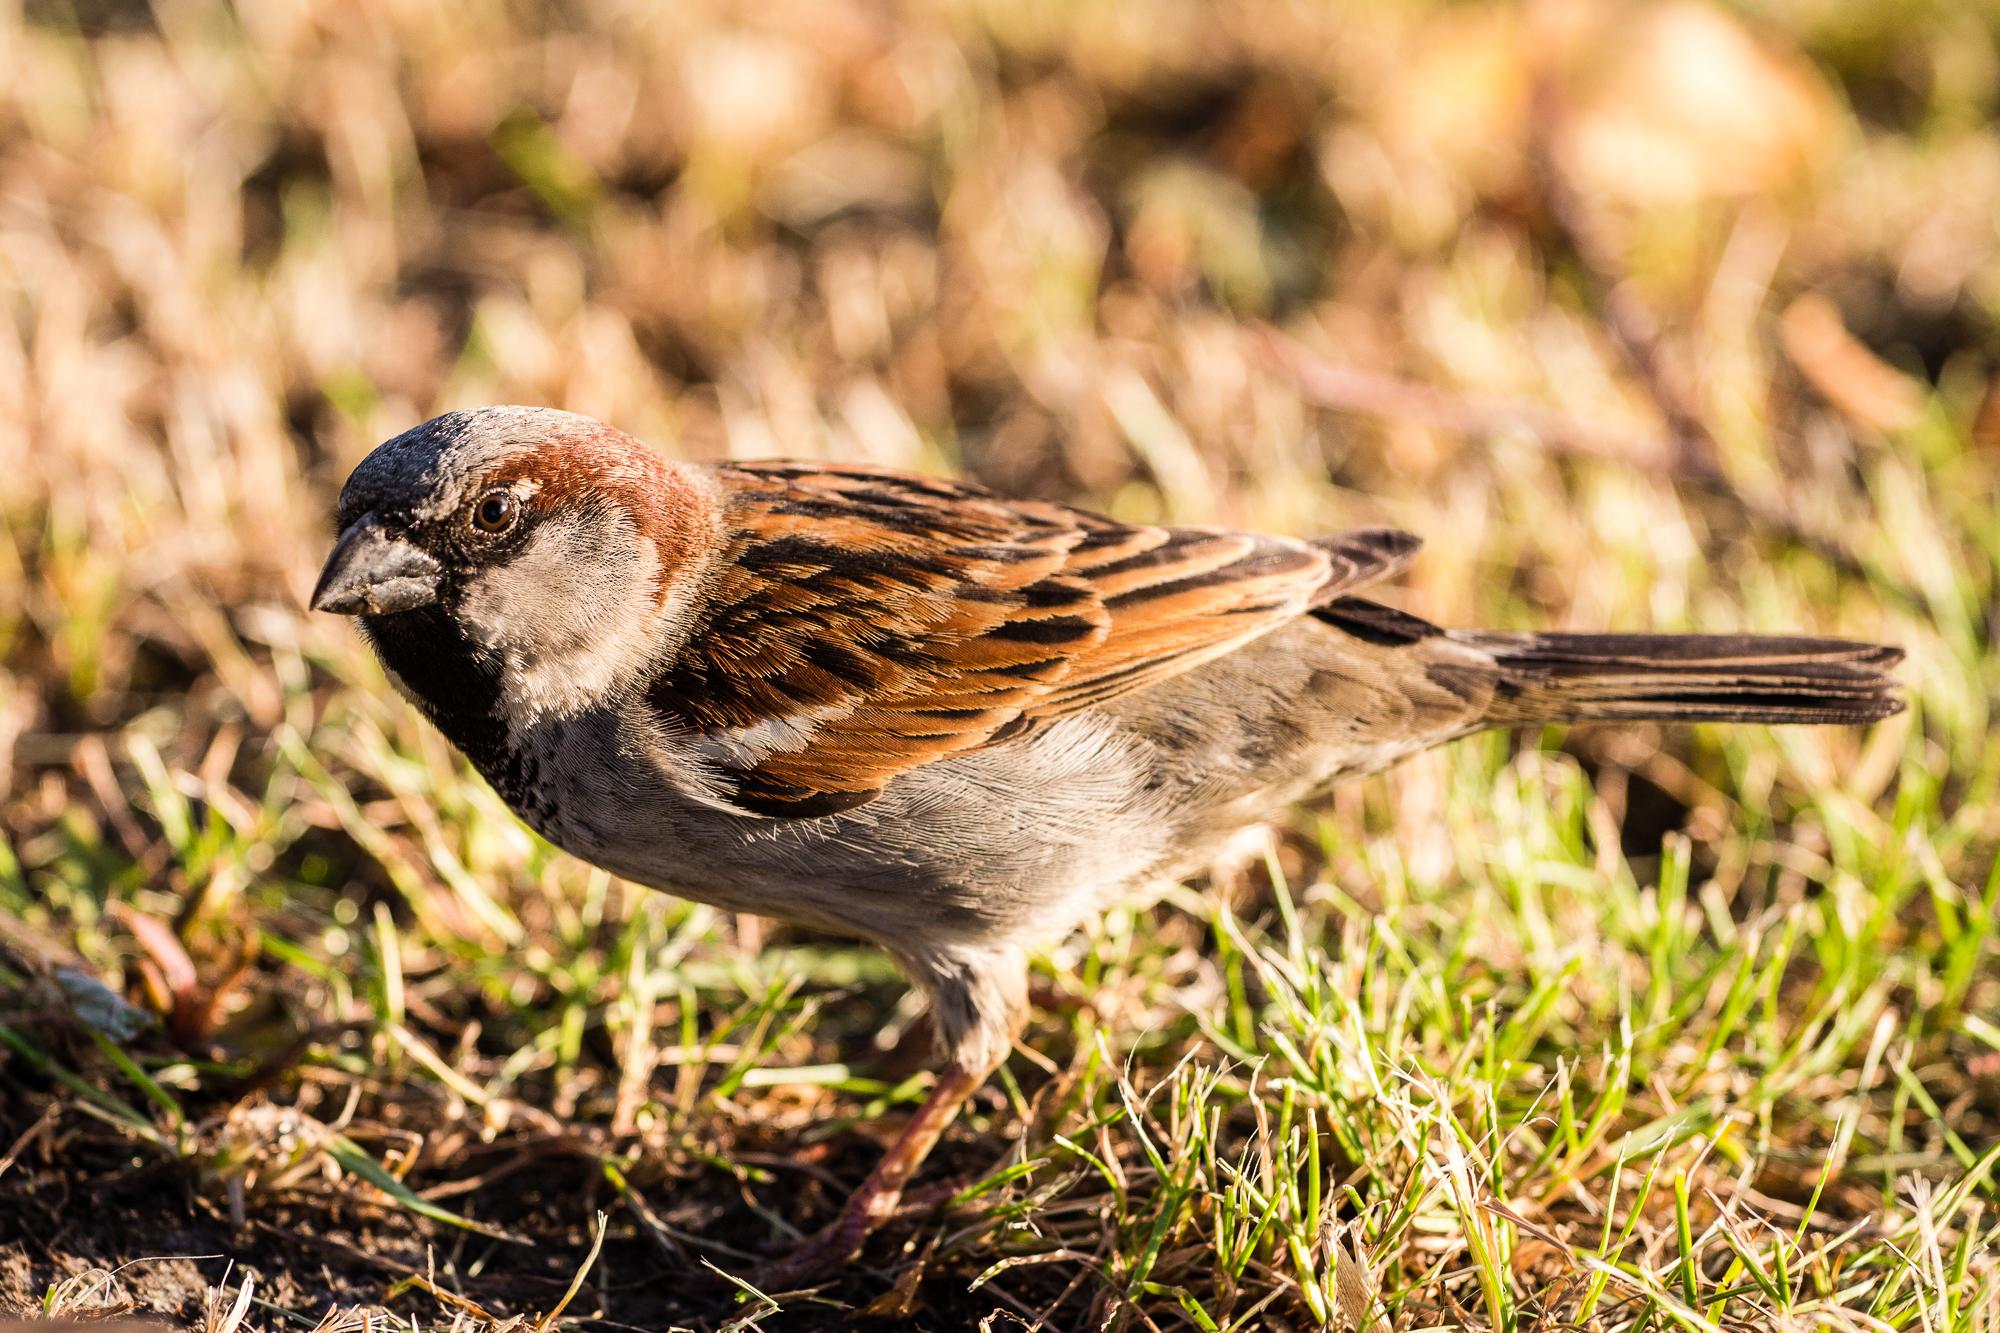 Brown Sparrow Via @Atisgailis